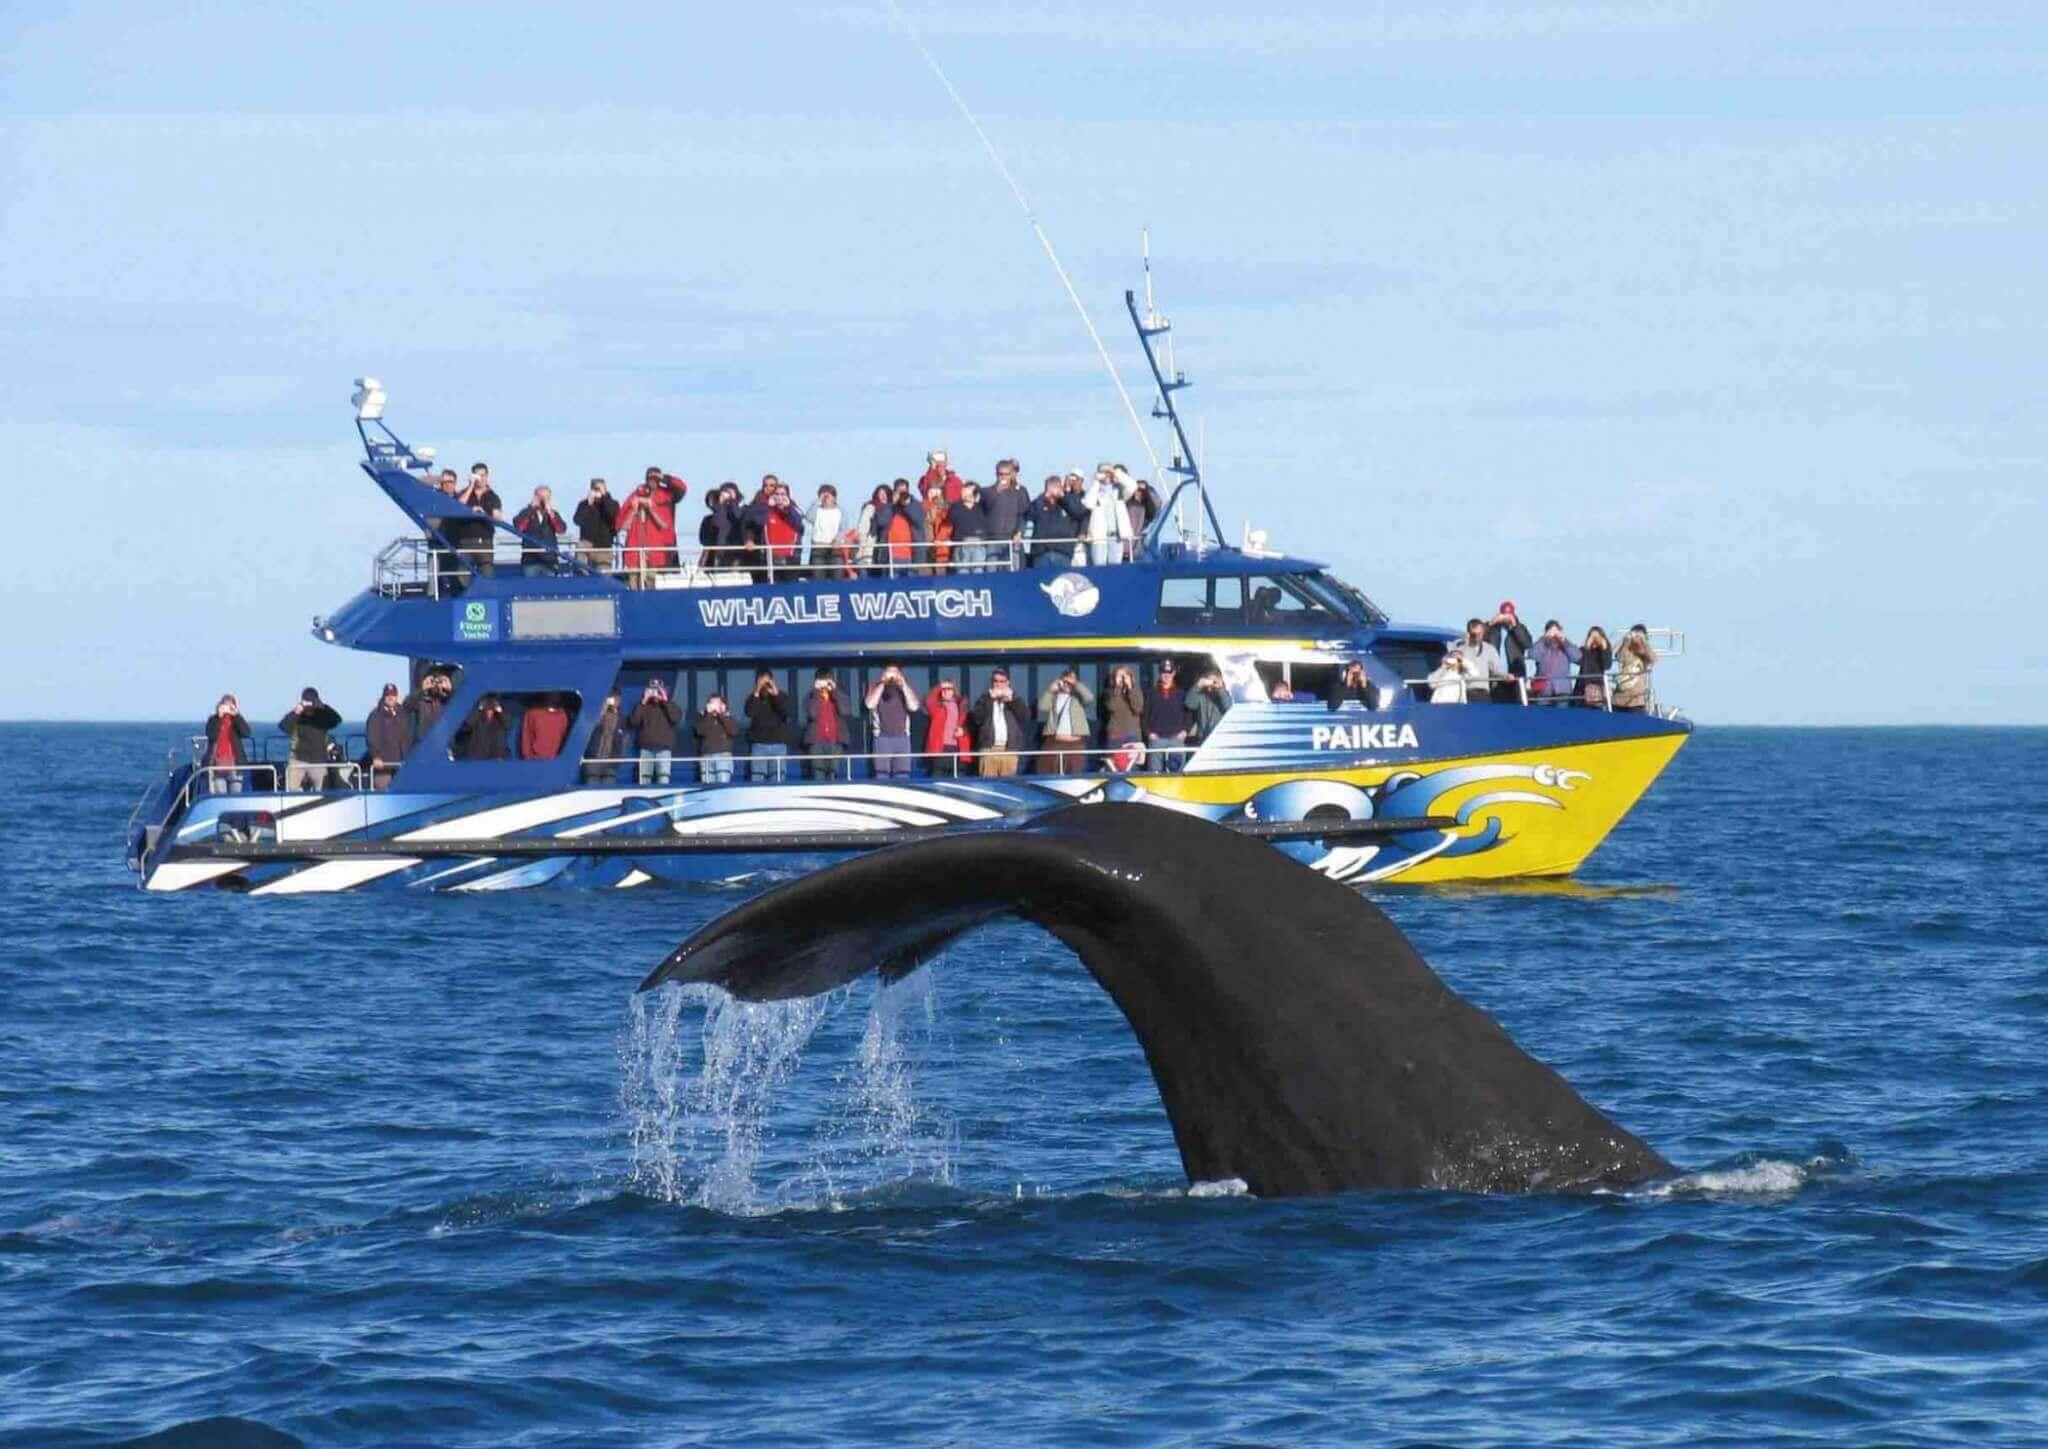 Whale Watch New Zealand